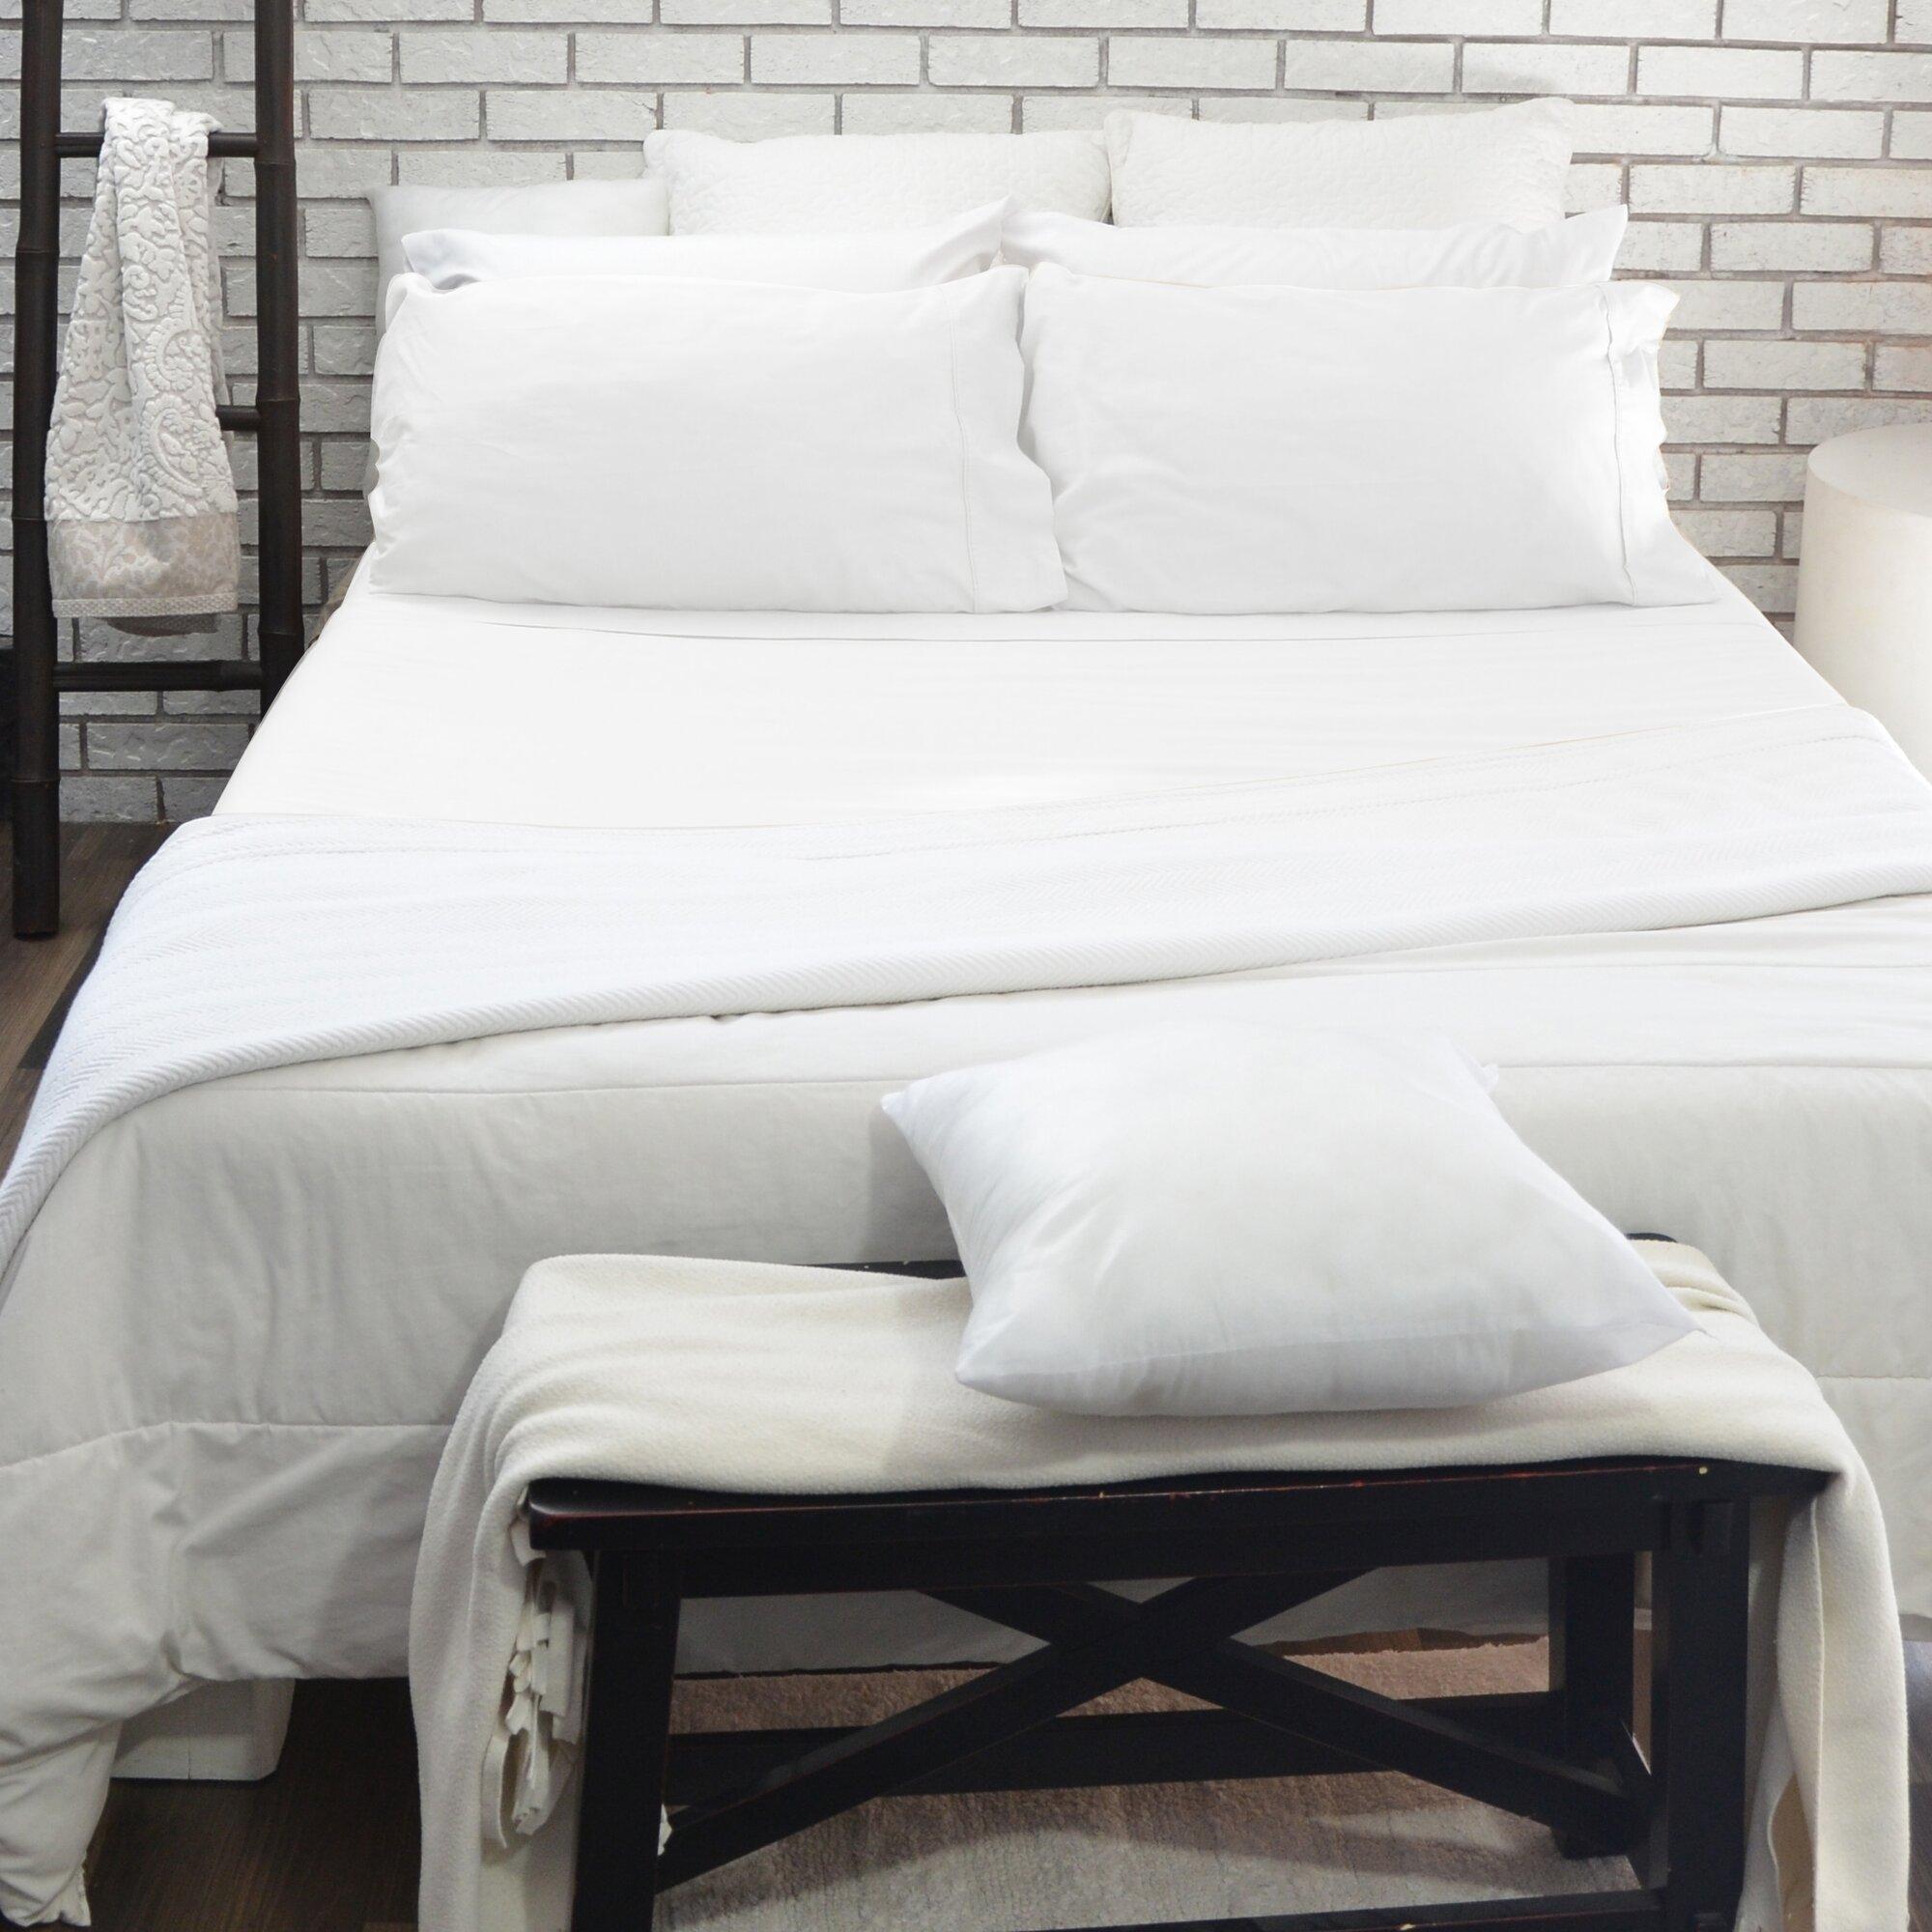 paarizaat 300 thread count 100 cotton sheet set reviews. Black Bedroom Furniture Sets. Home Design Ideas